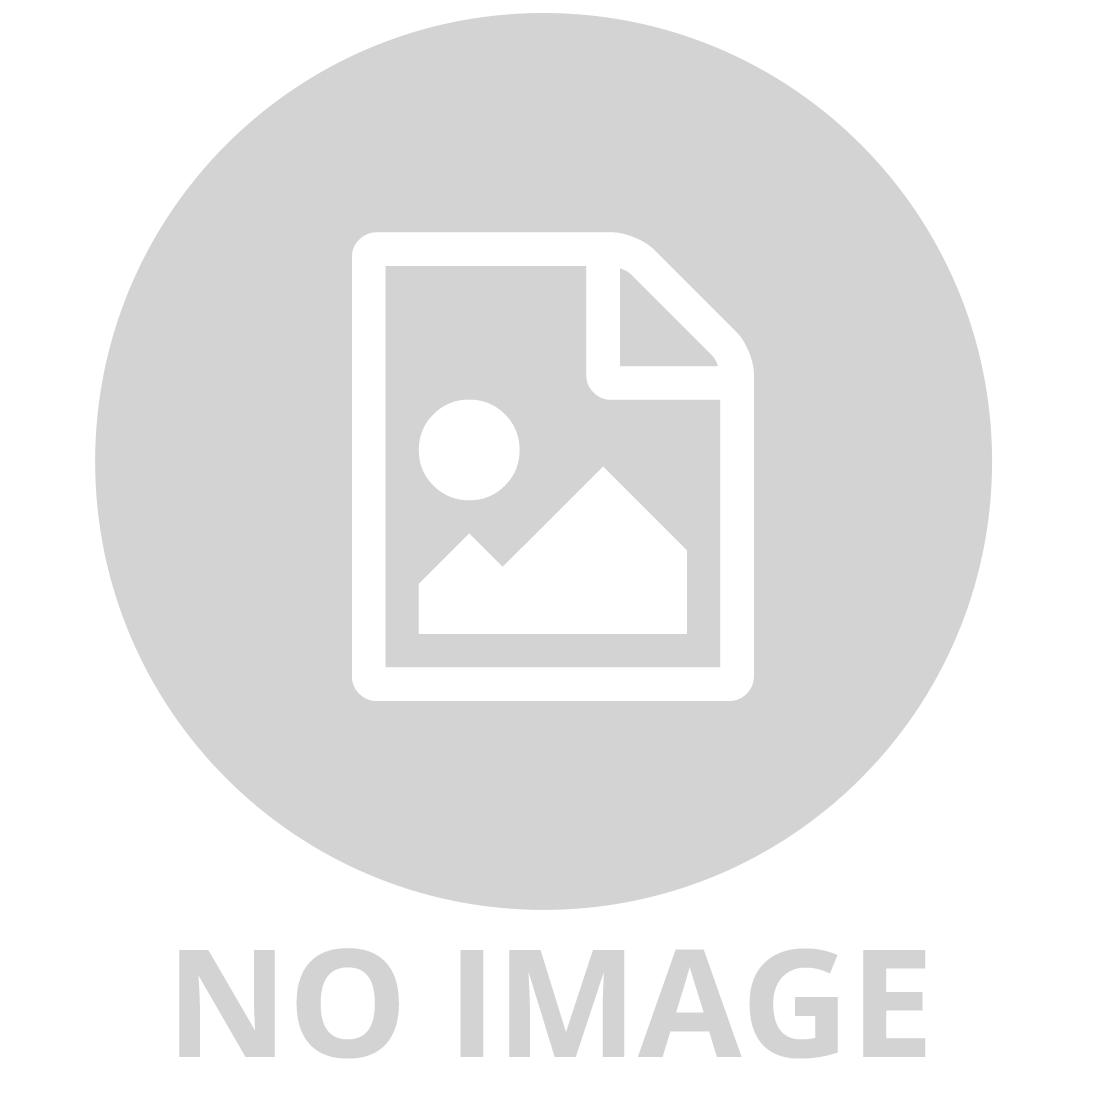 WAHU SURFER DUDES